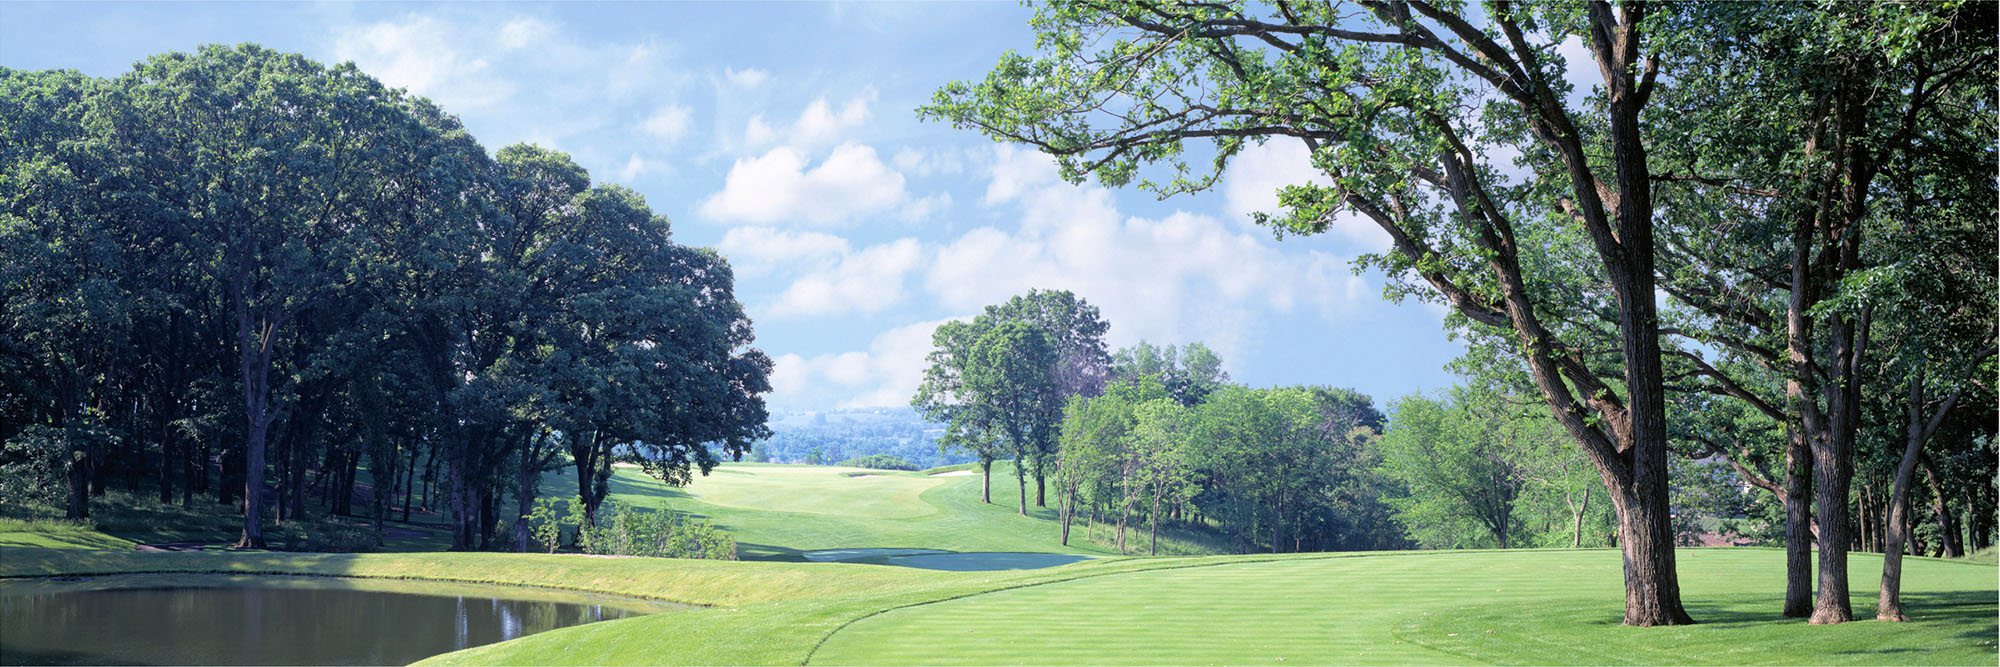 Golf Course Image - Glen Oaks No. 1